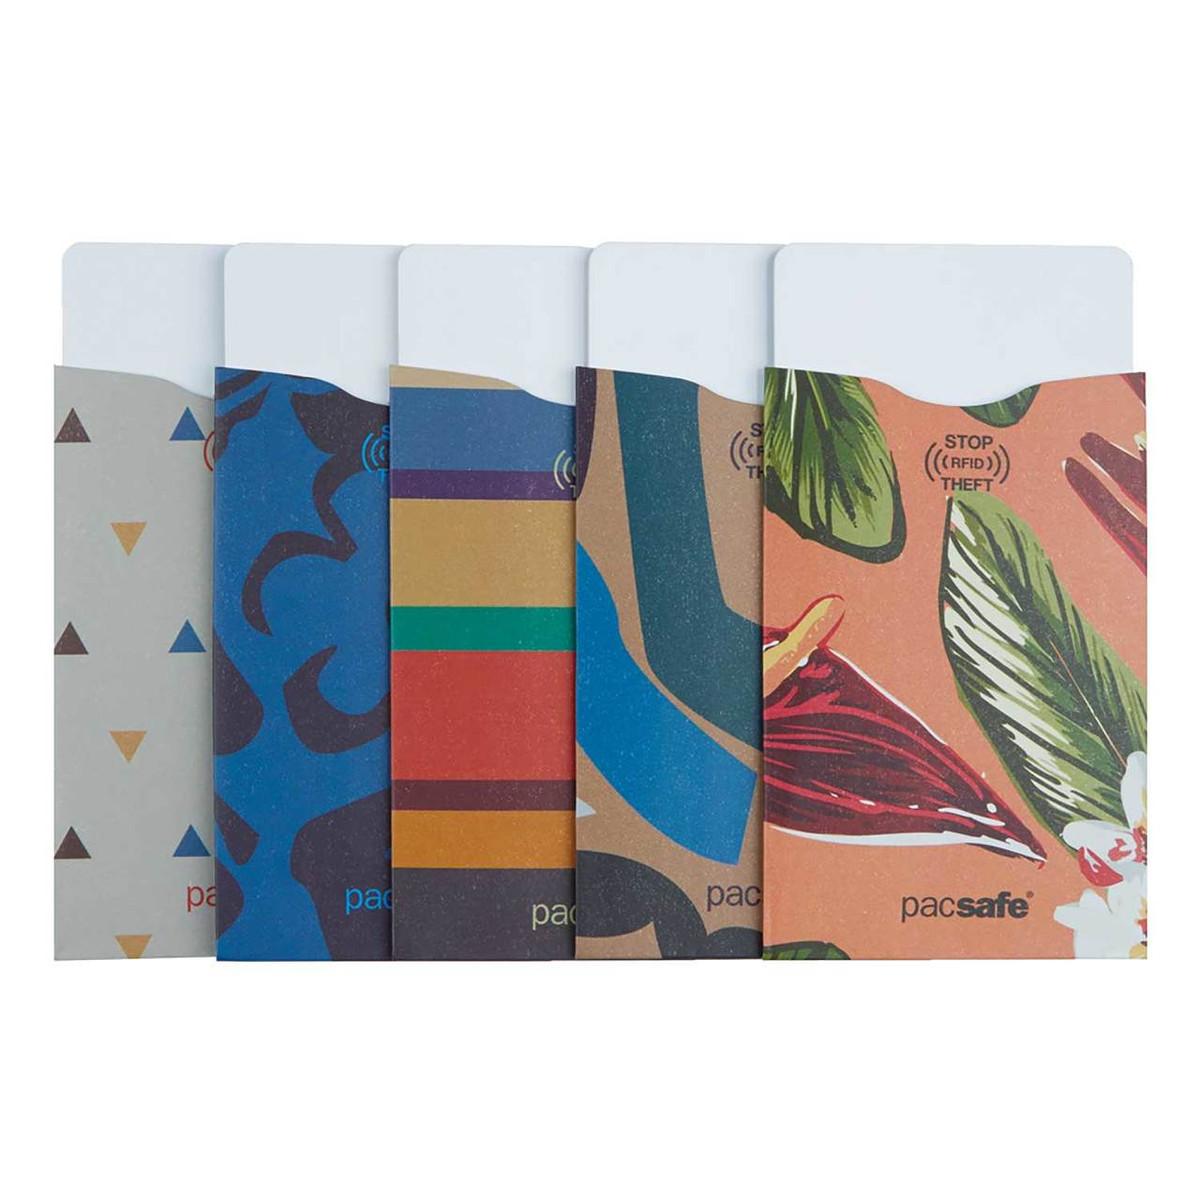 Pacsafe RFIDsleeve 25 credit card sleeve (5 pack)